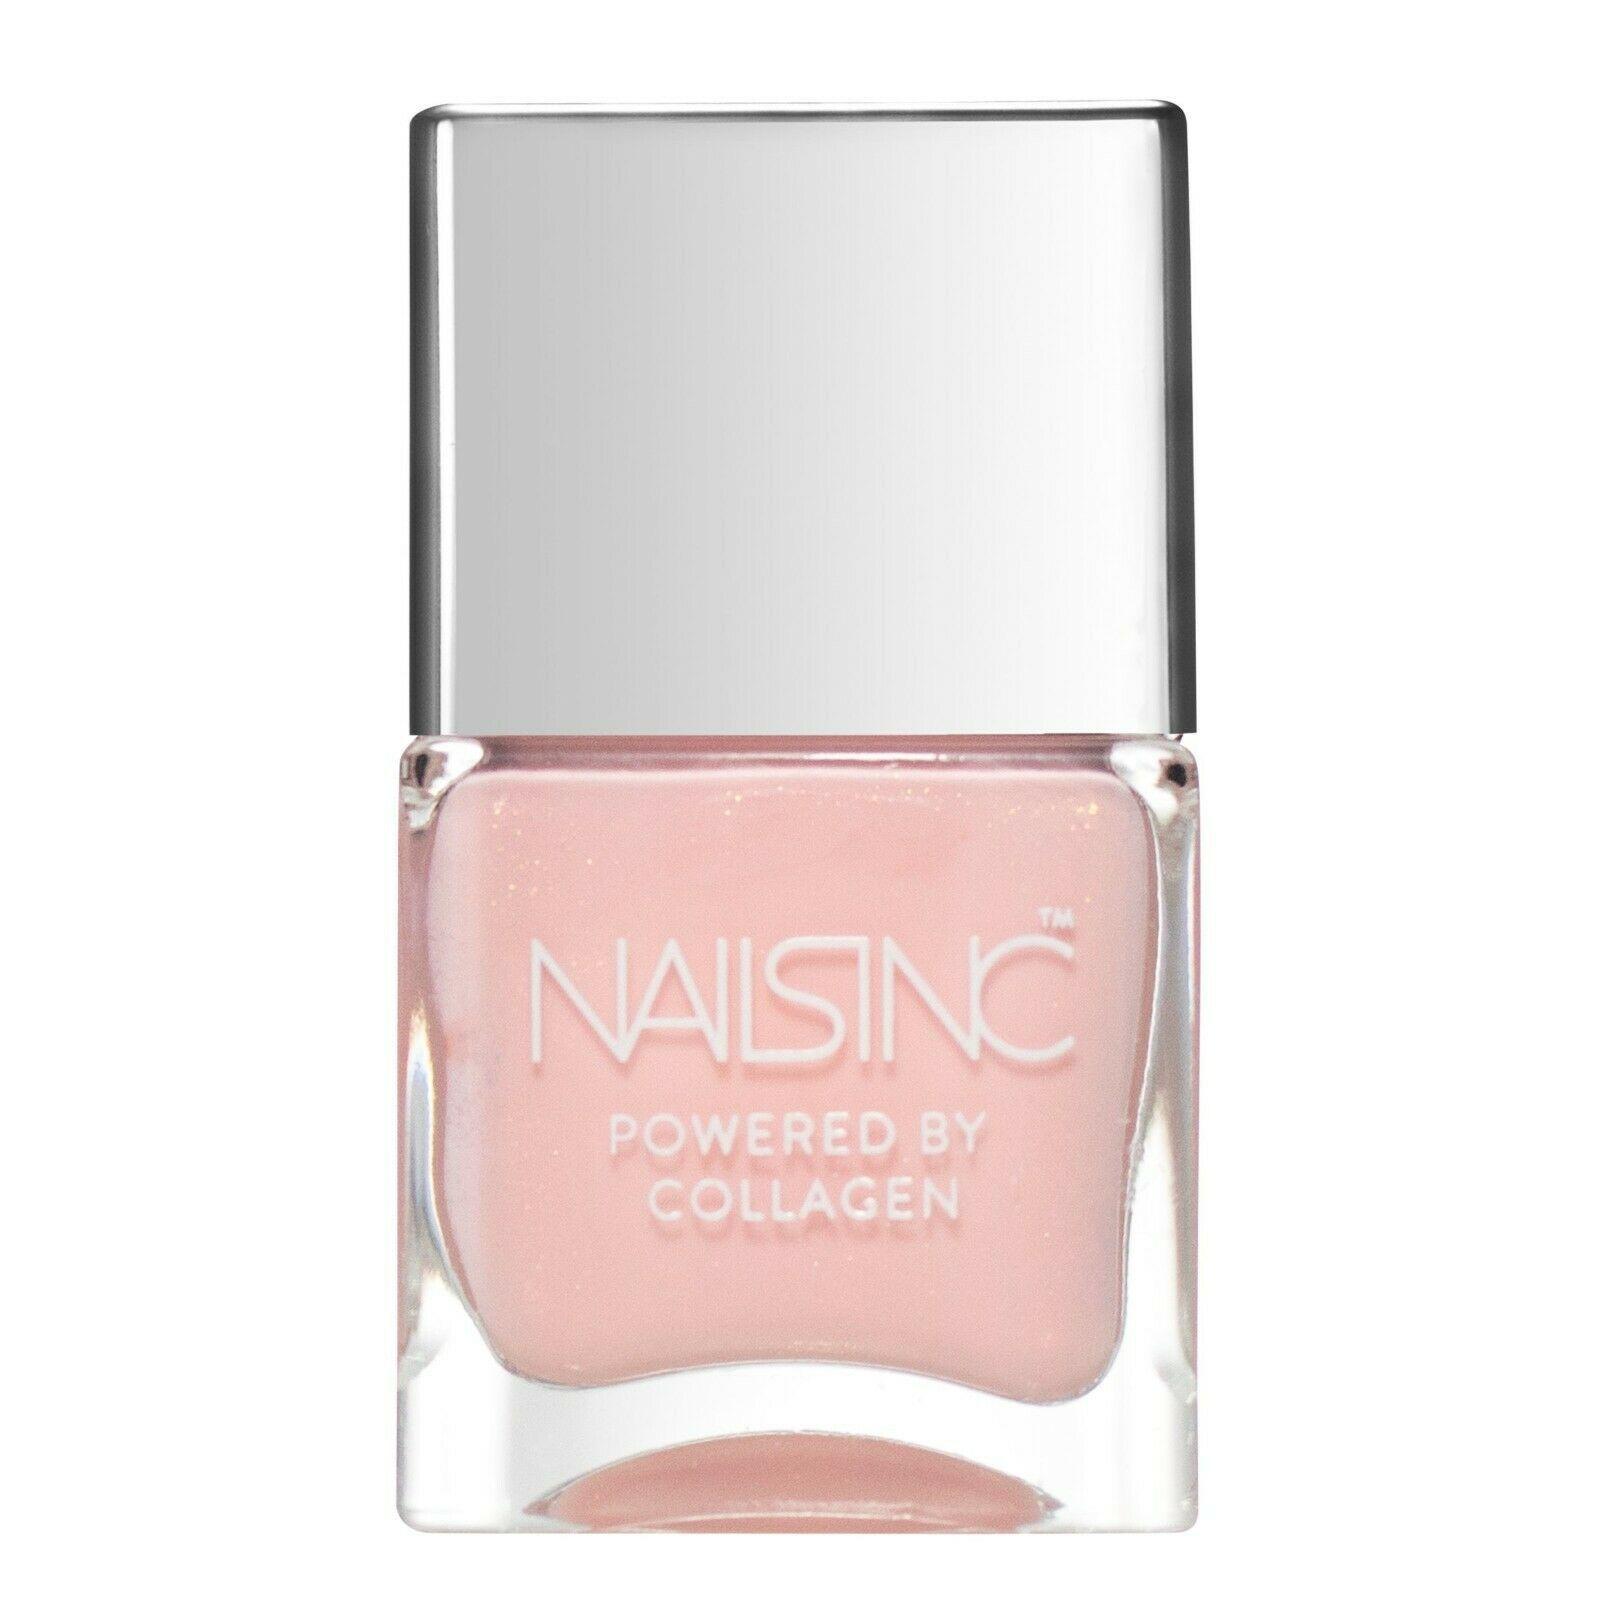 Nails Inc London Nail Polish 14ml - Conceal and Reveal